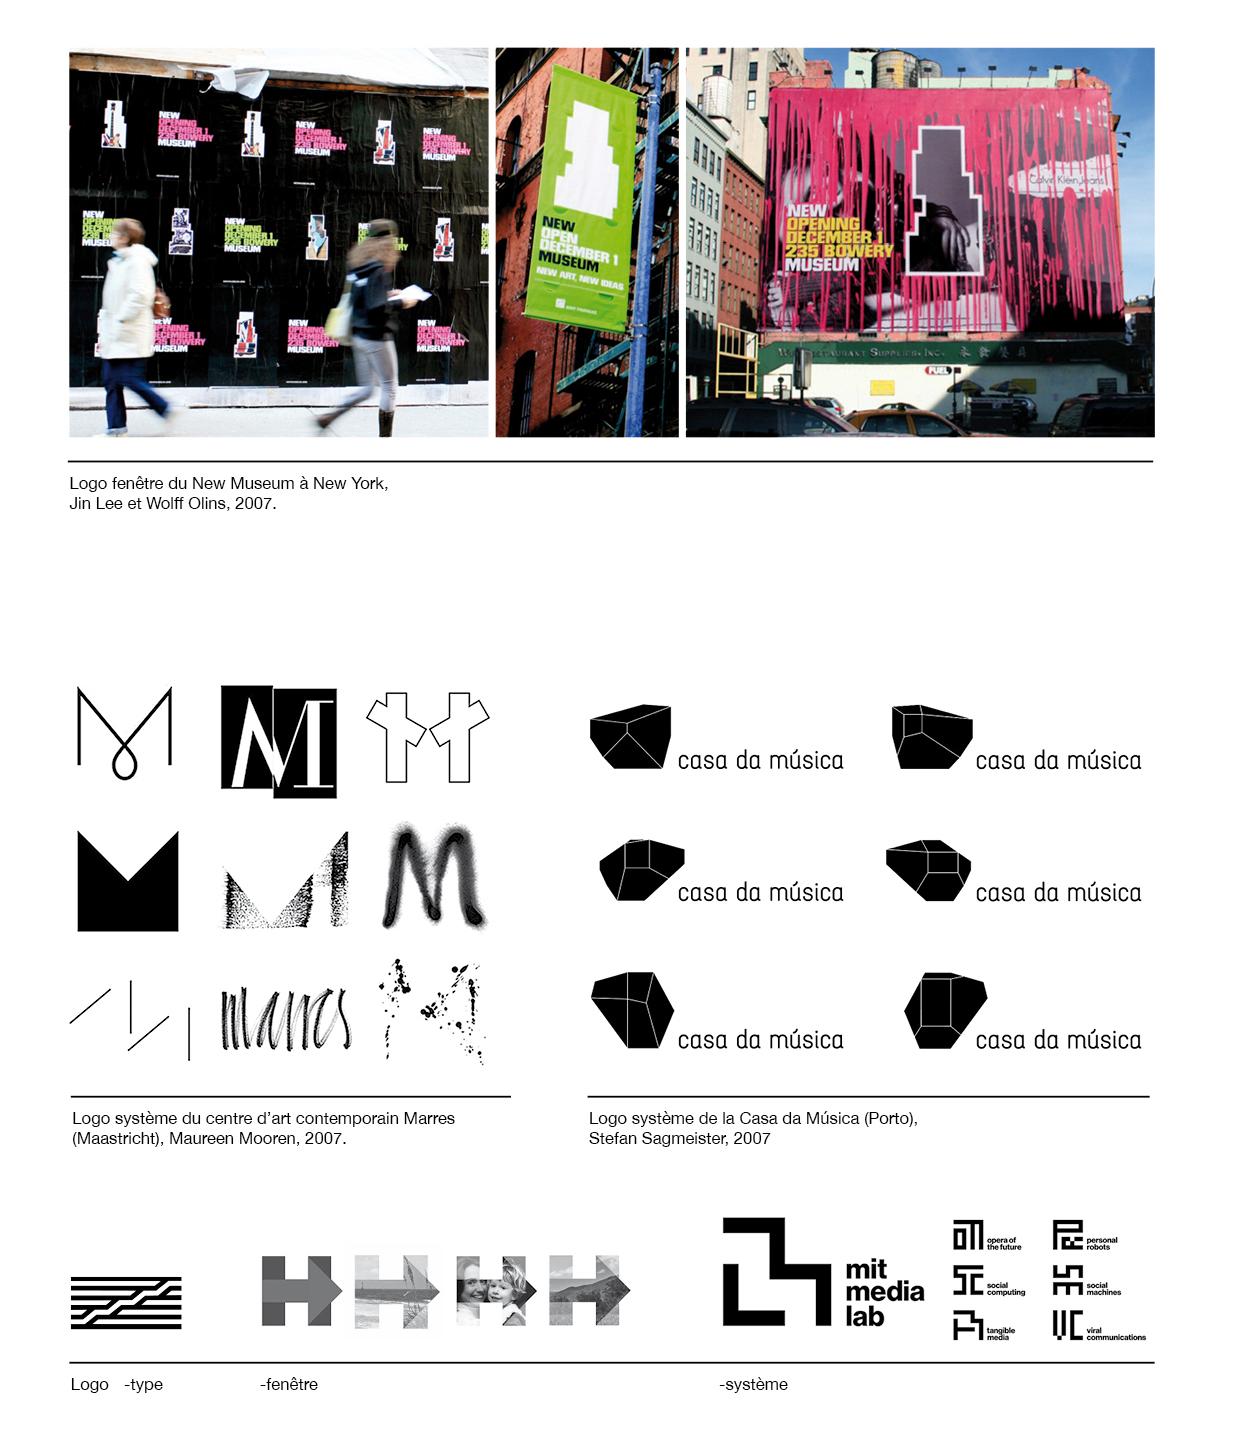 Logologie_Iconographie5